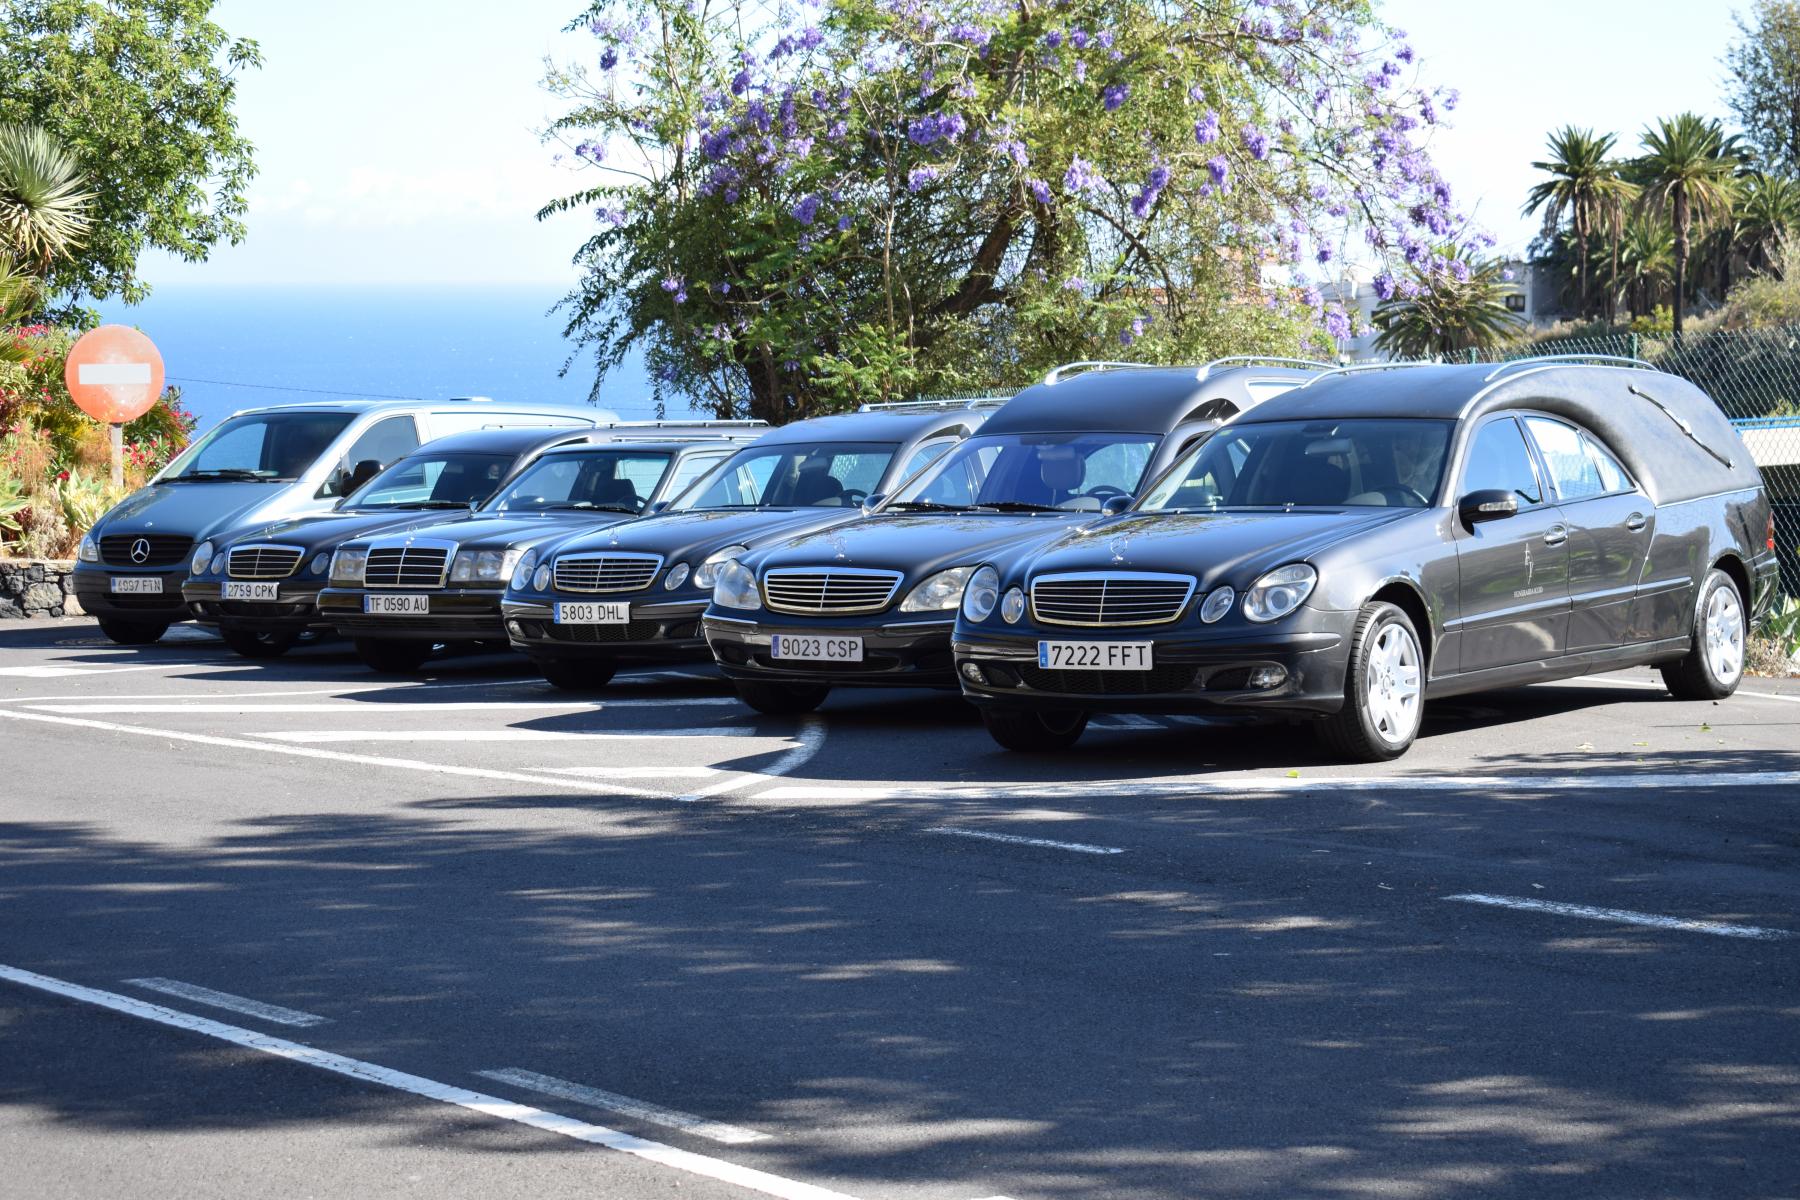 Flota de vehiculos Funeraria Icod Torano